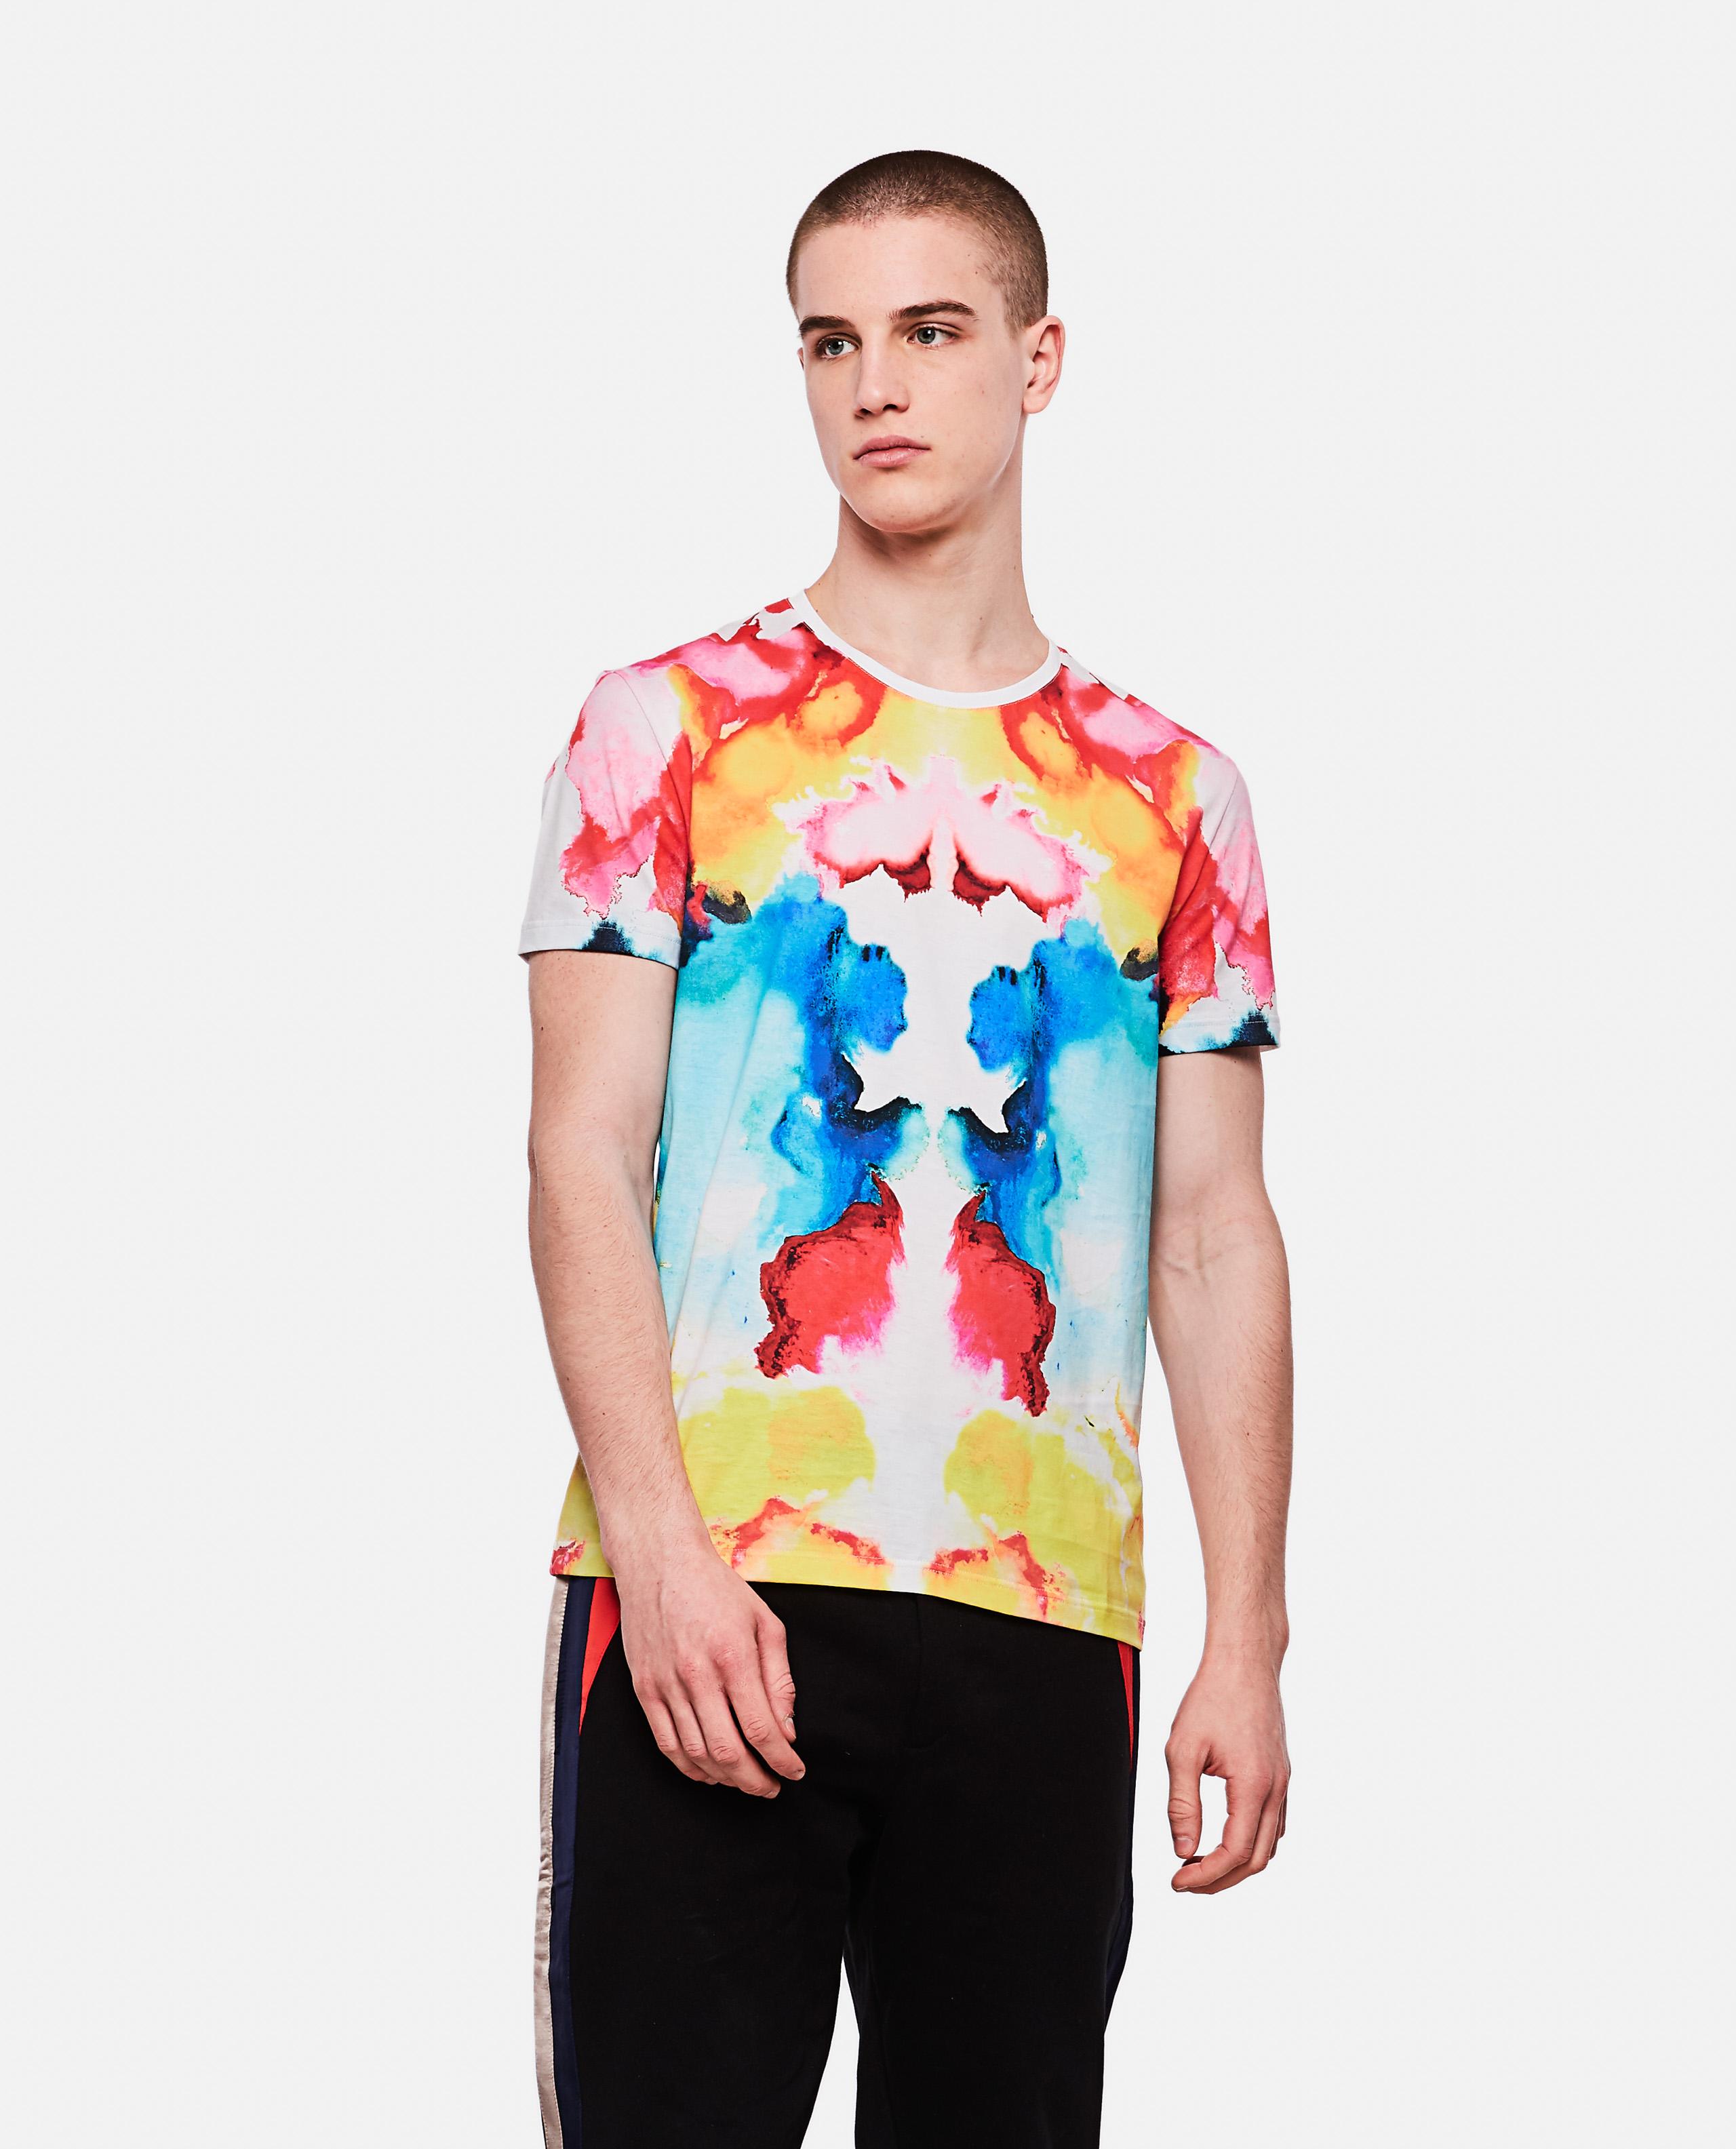 T-shirt with tie dye pattern